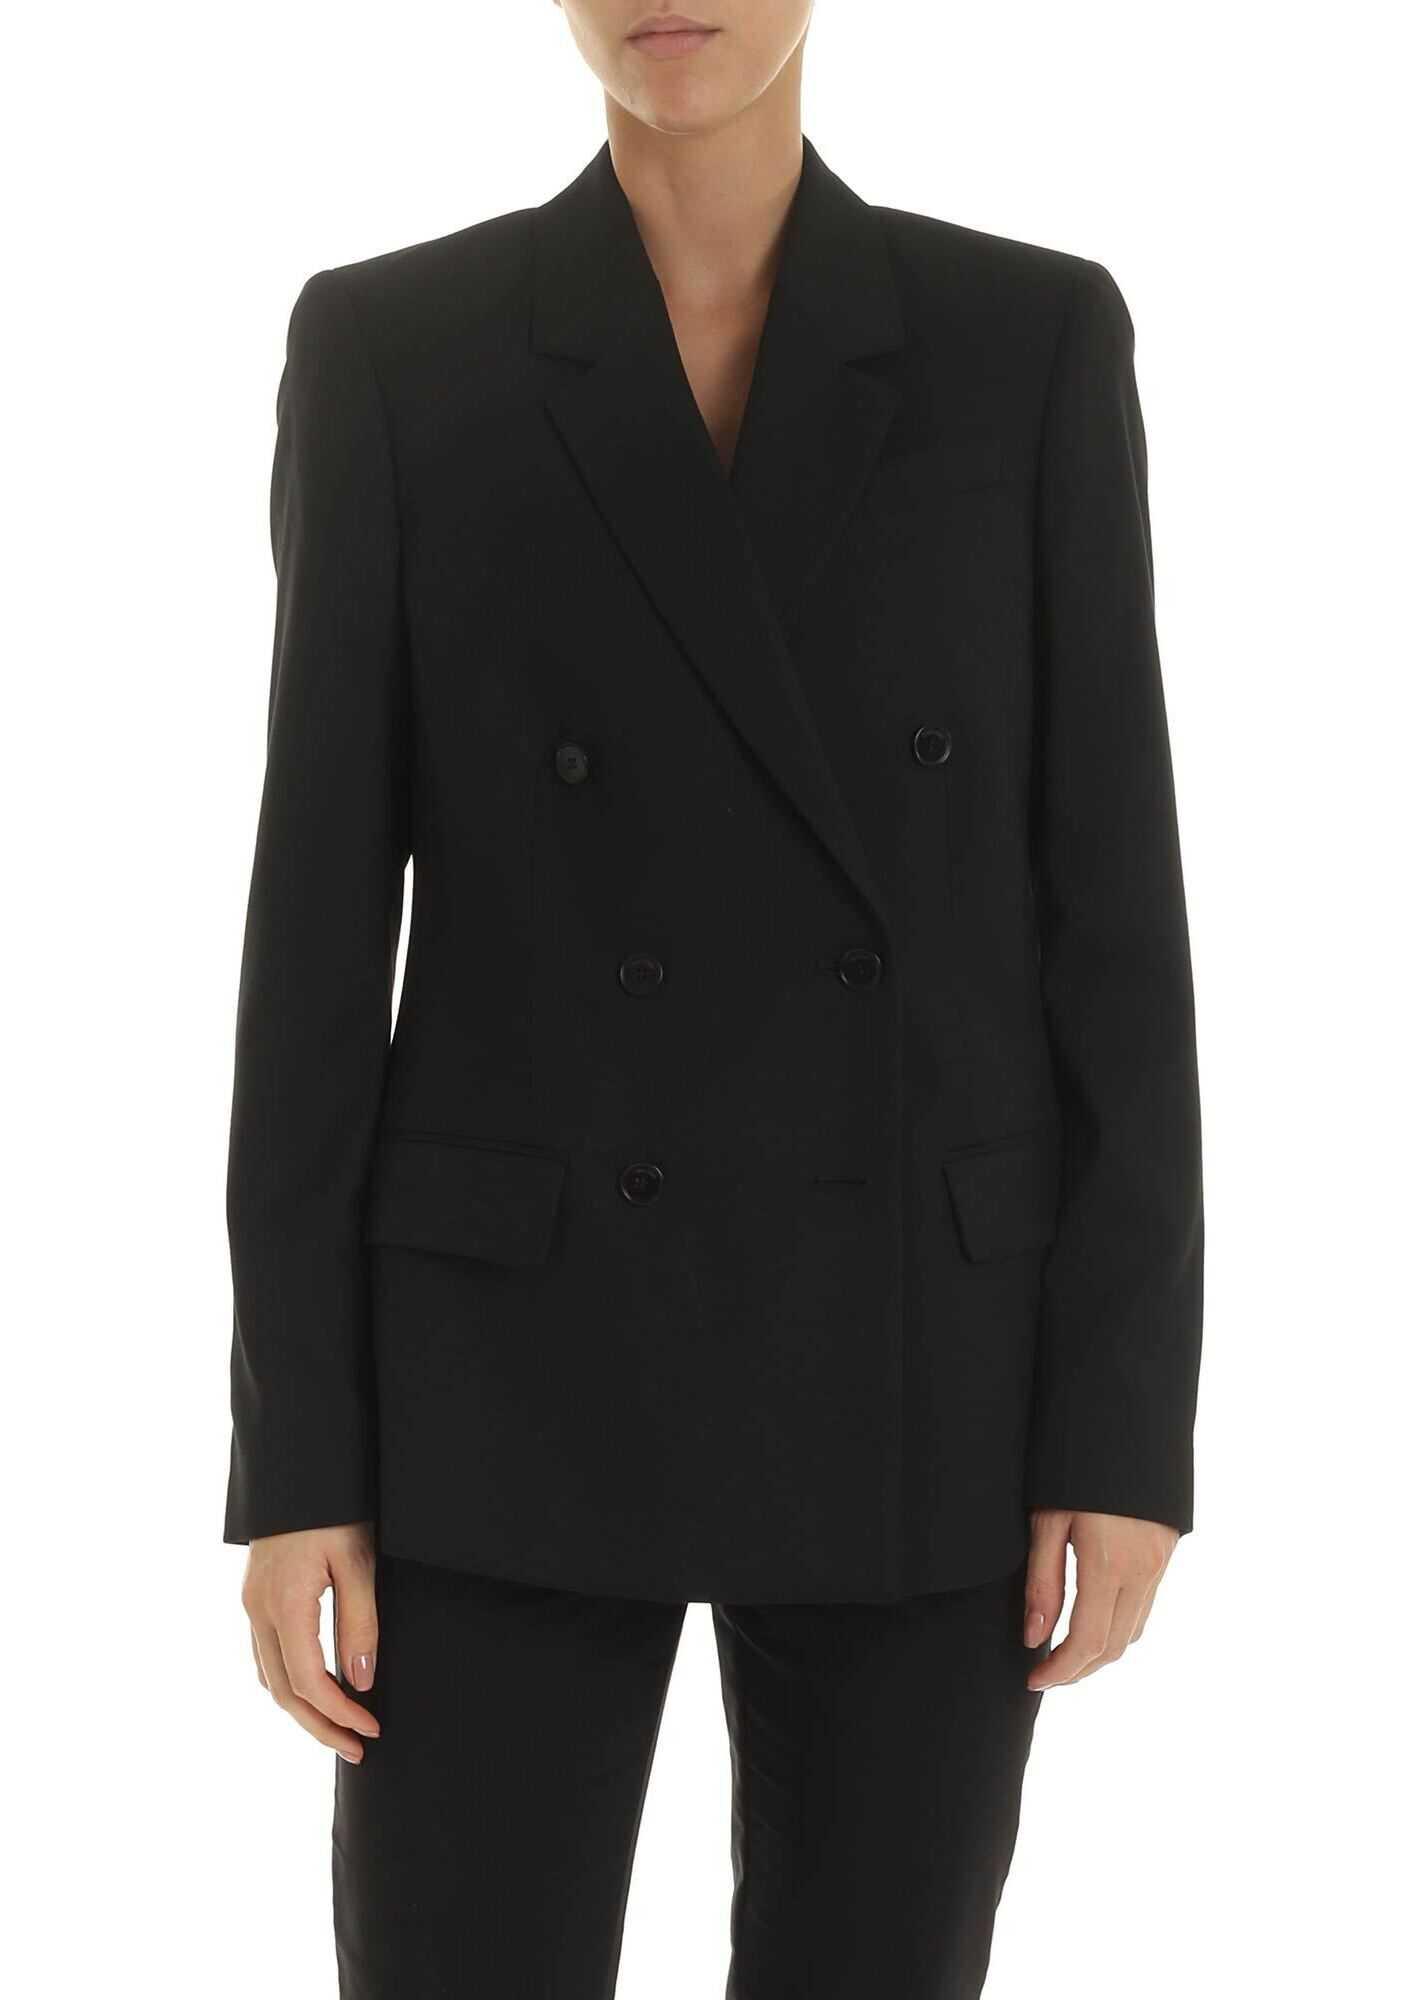 Calvin Klein Double-Breasted Jacket In Black Wool Twill Black